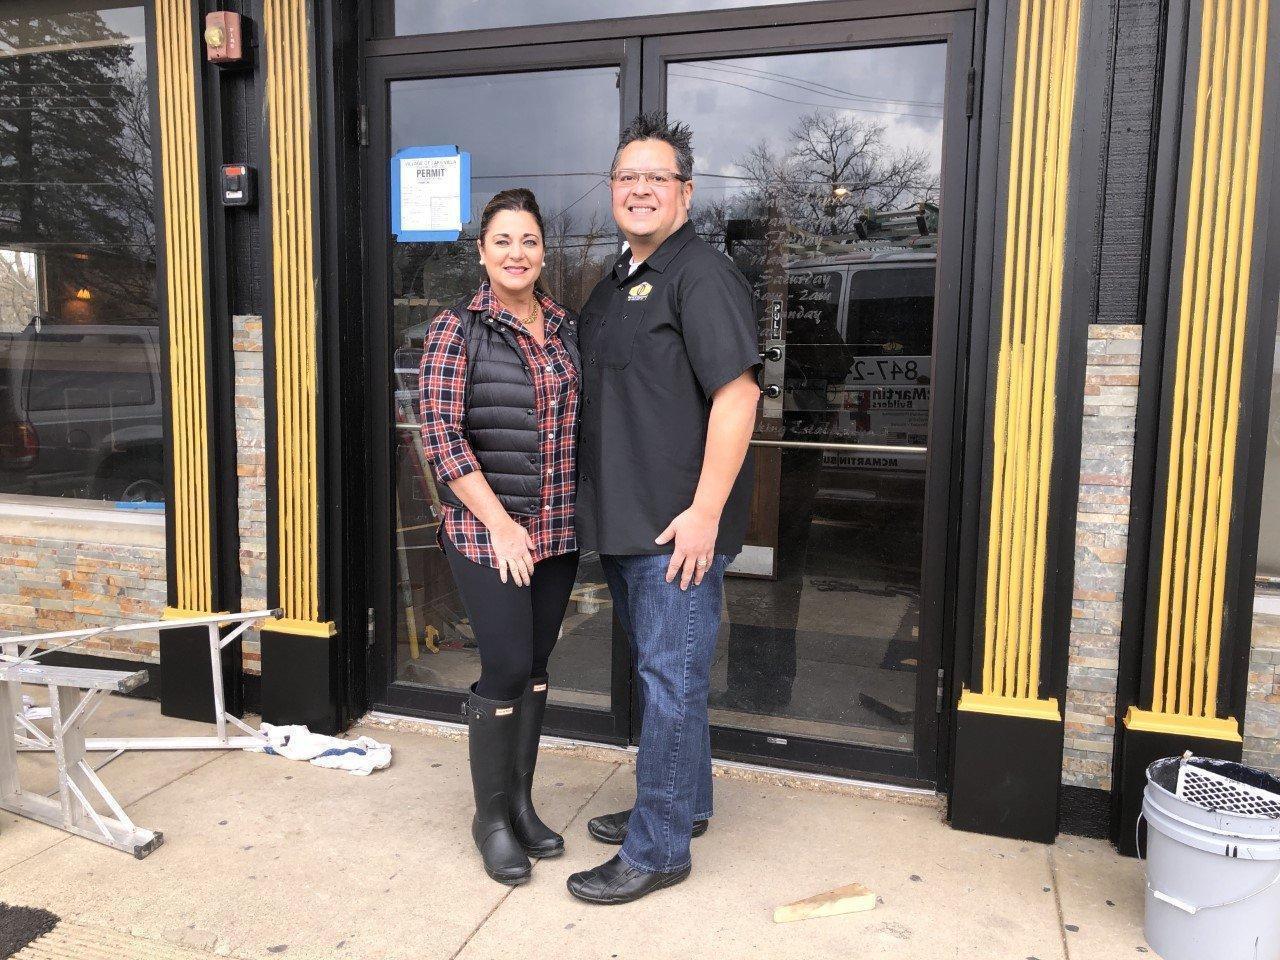 Planned pub opening part of Lake Villa revitalization